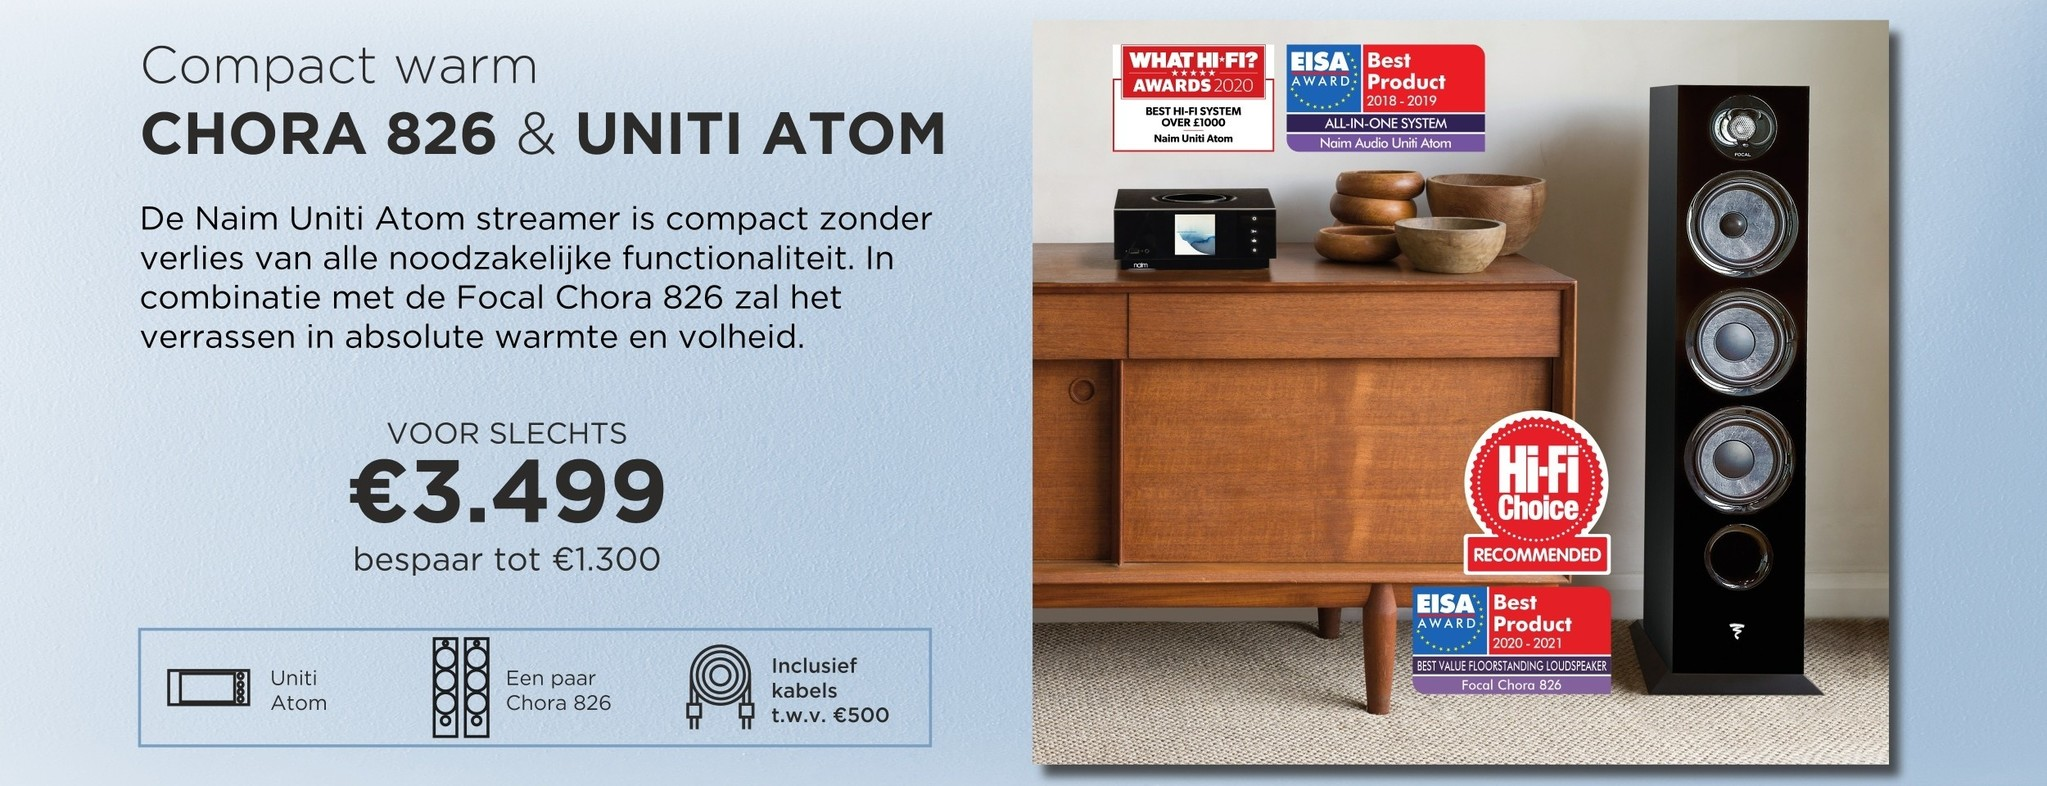 chora 826&Uniti atom